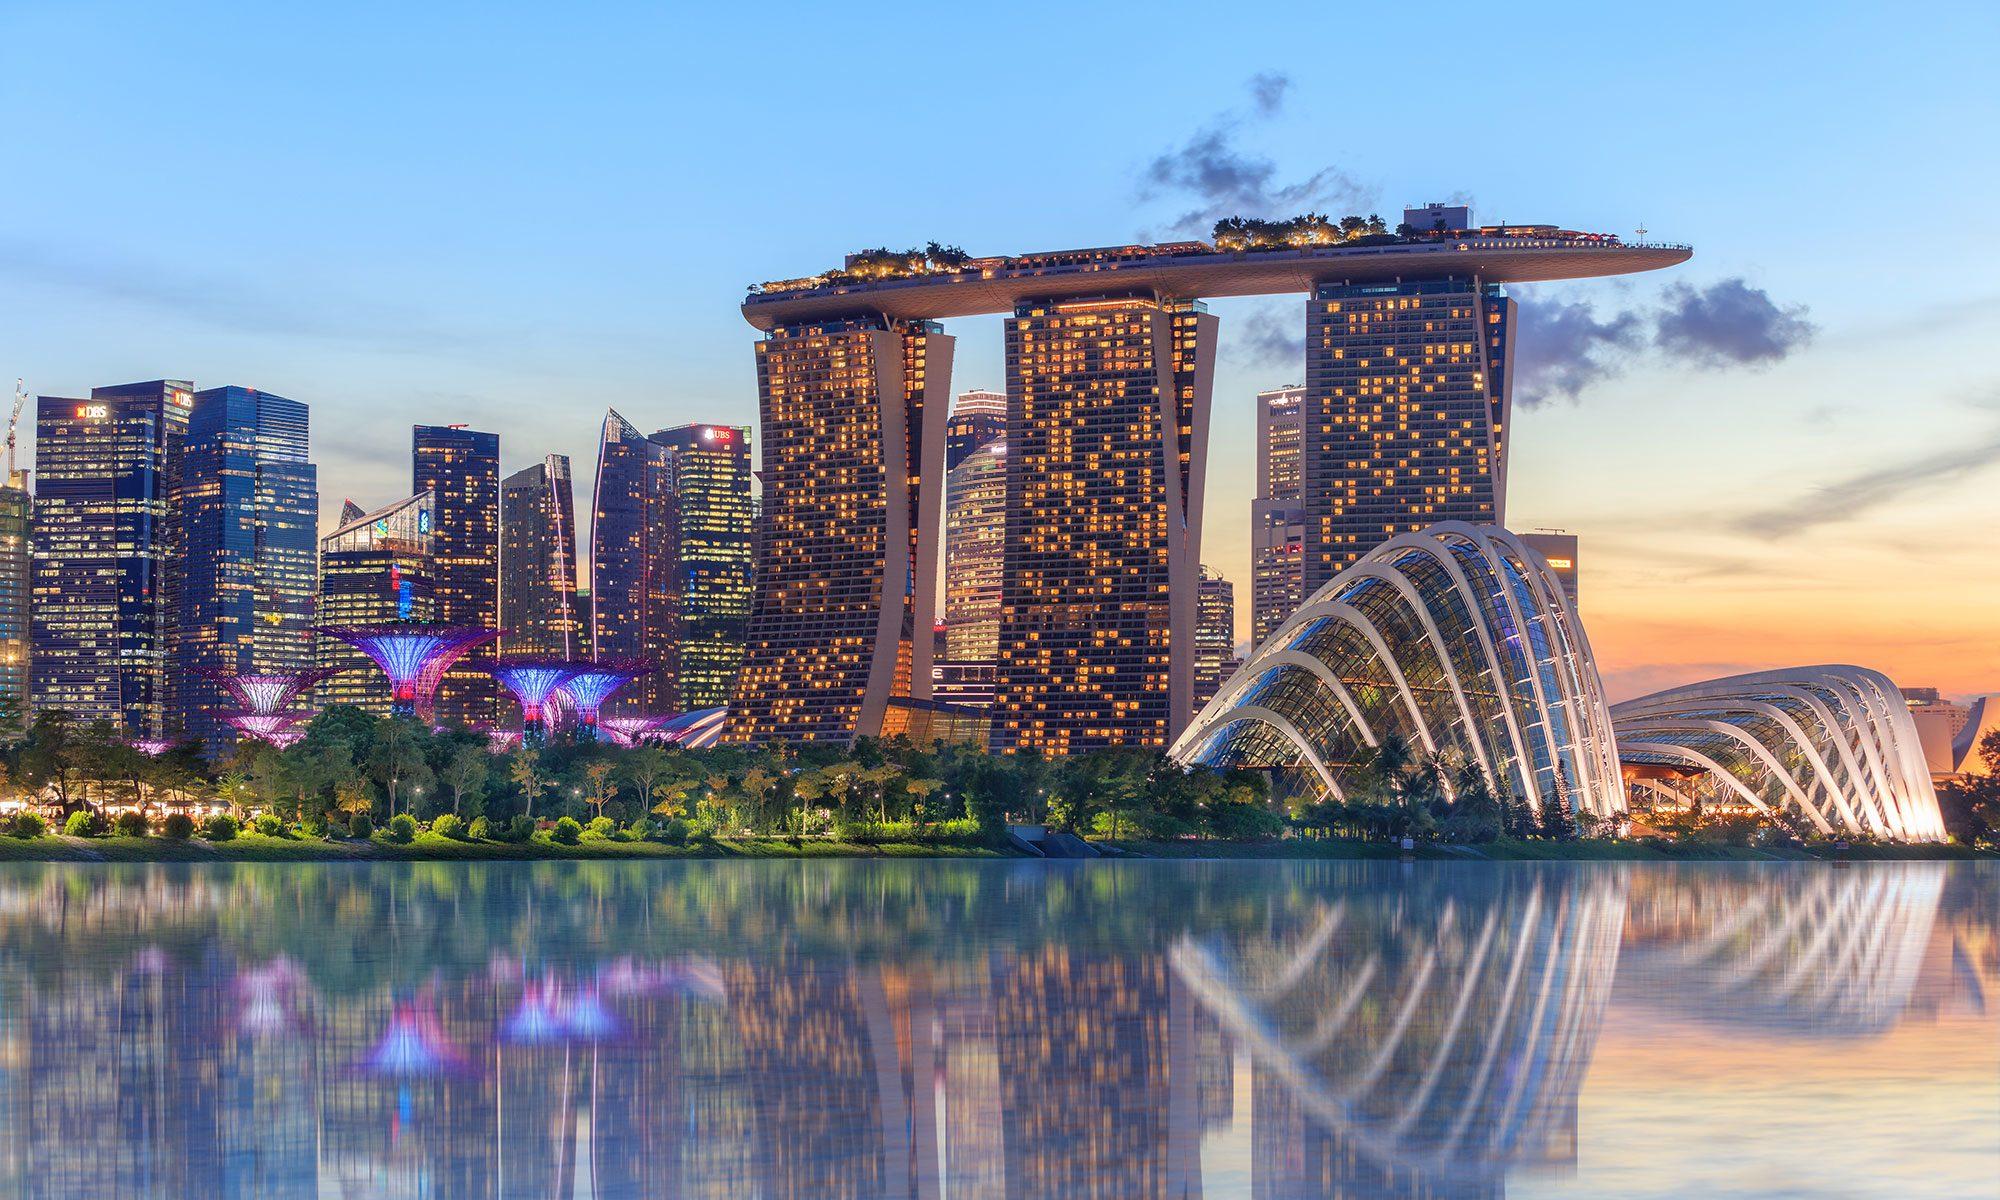 marina-bay-sands-singapur.apuwe6ig.jpg